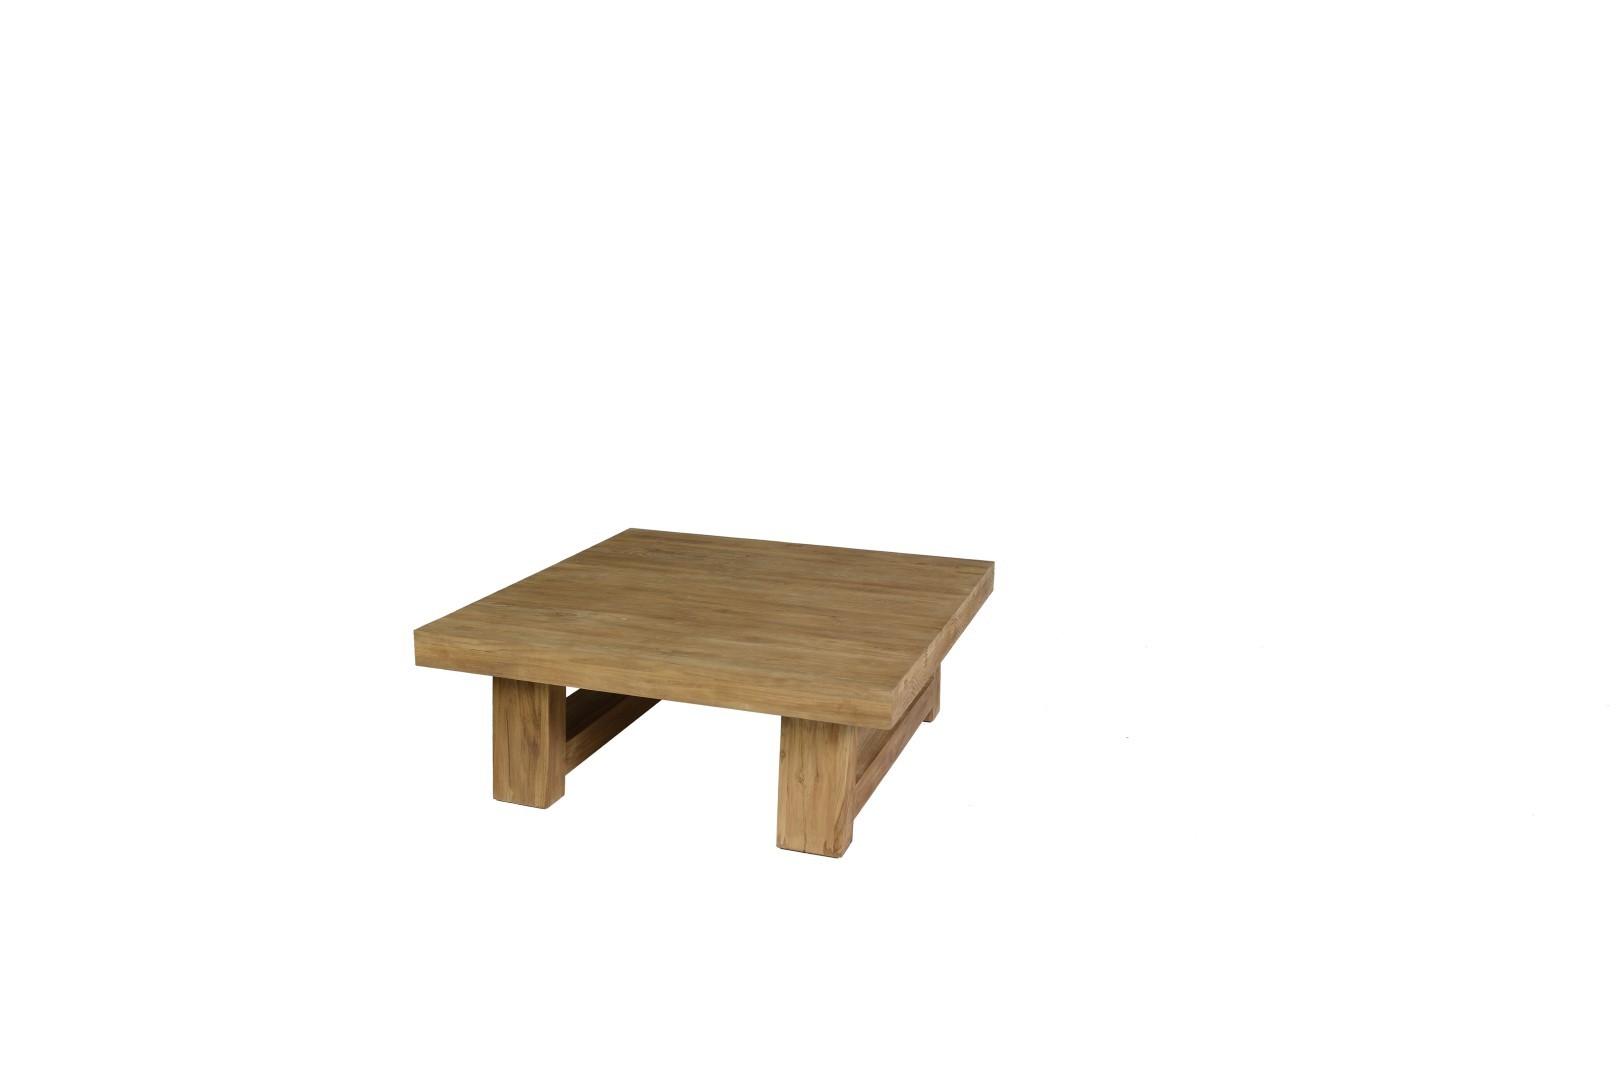 Thomas coffee table 110x110x43 cm teak